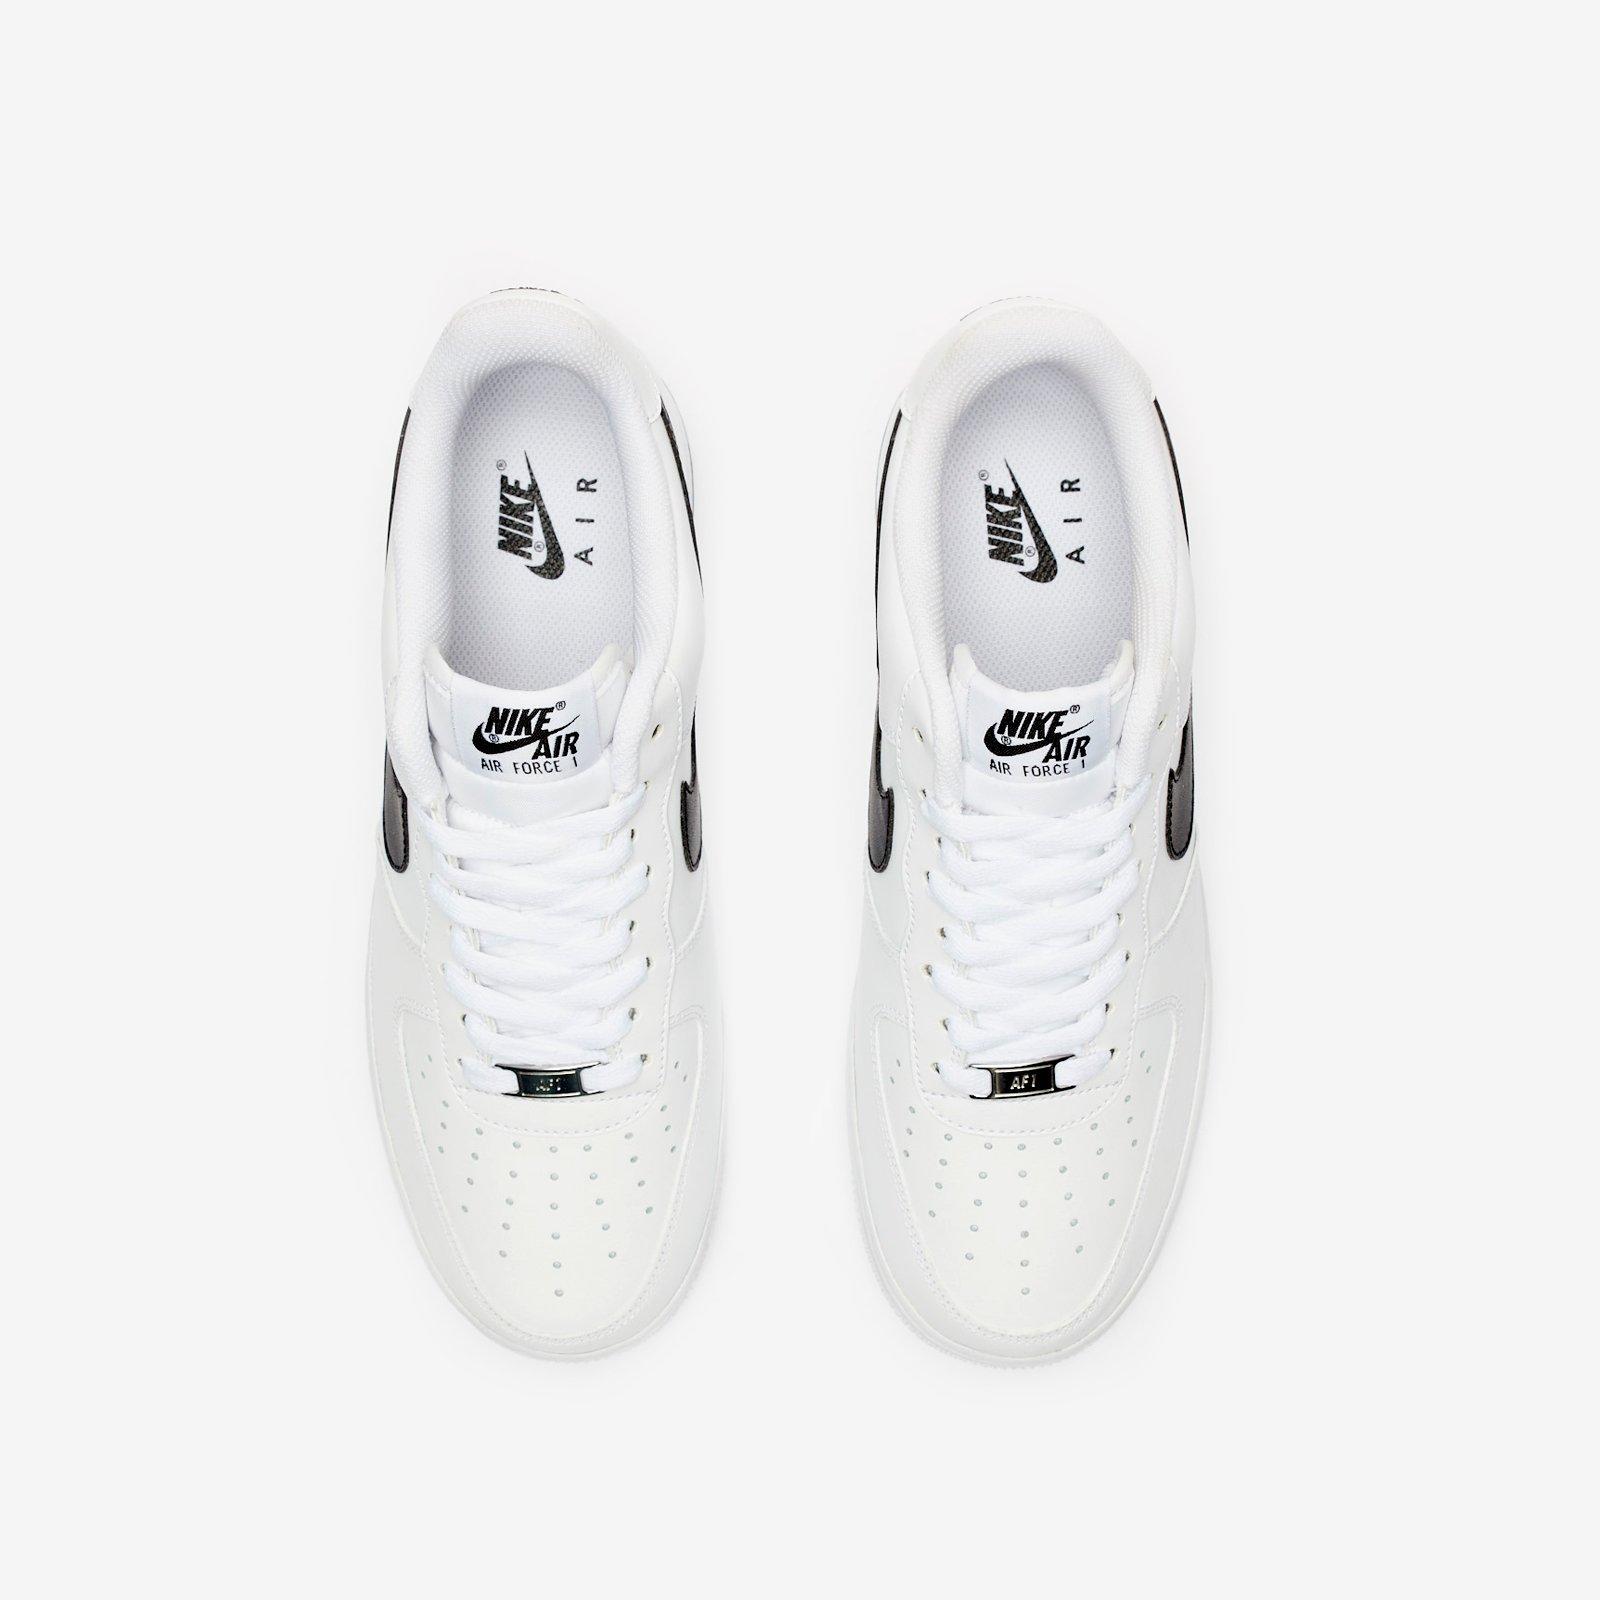 Nike Air Force 1 07 AN20 Cj0952 100 Sneakersnstuff